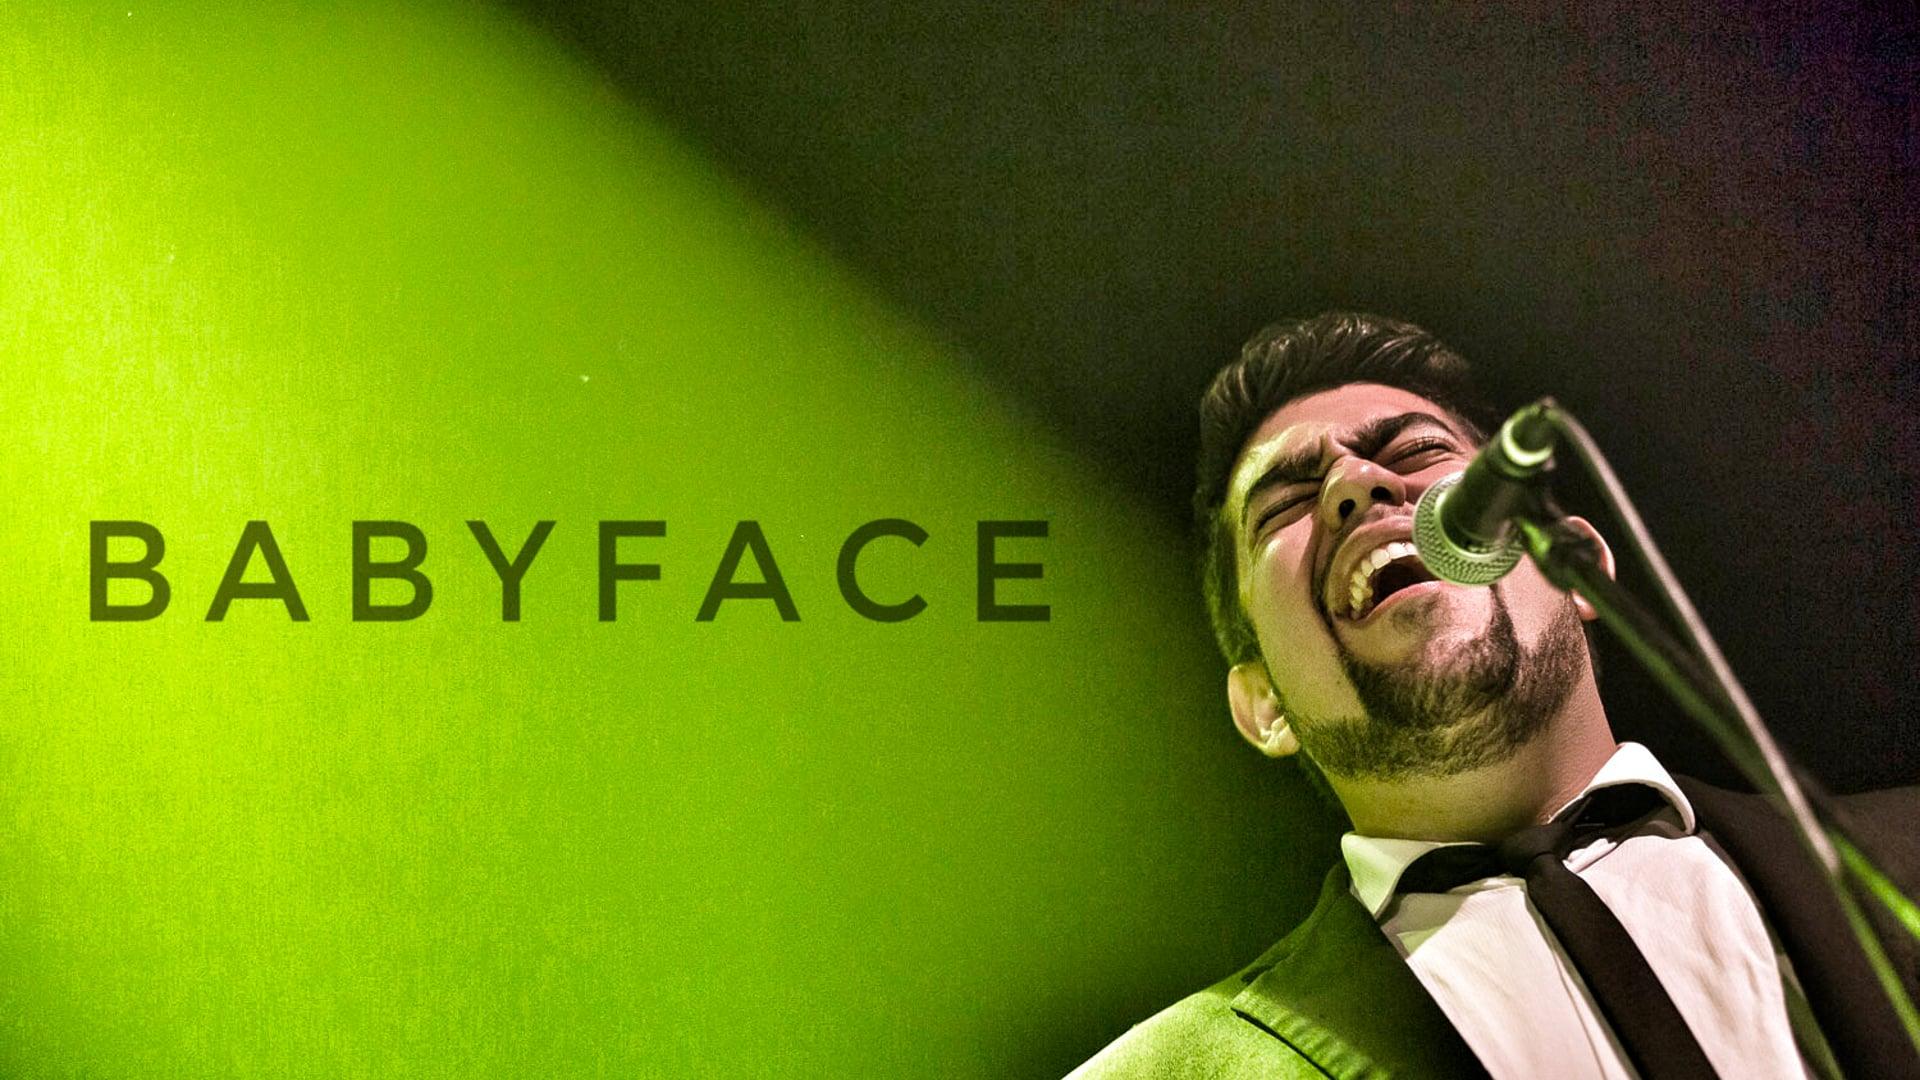 Babyface Member Feature